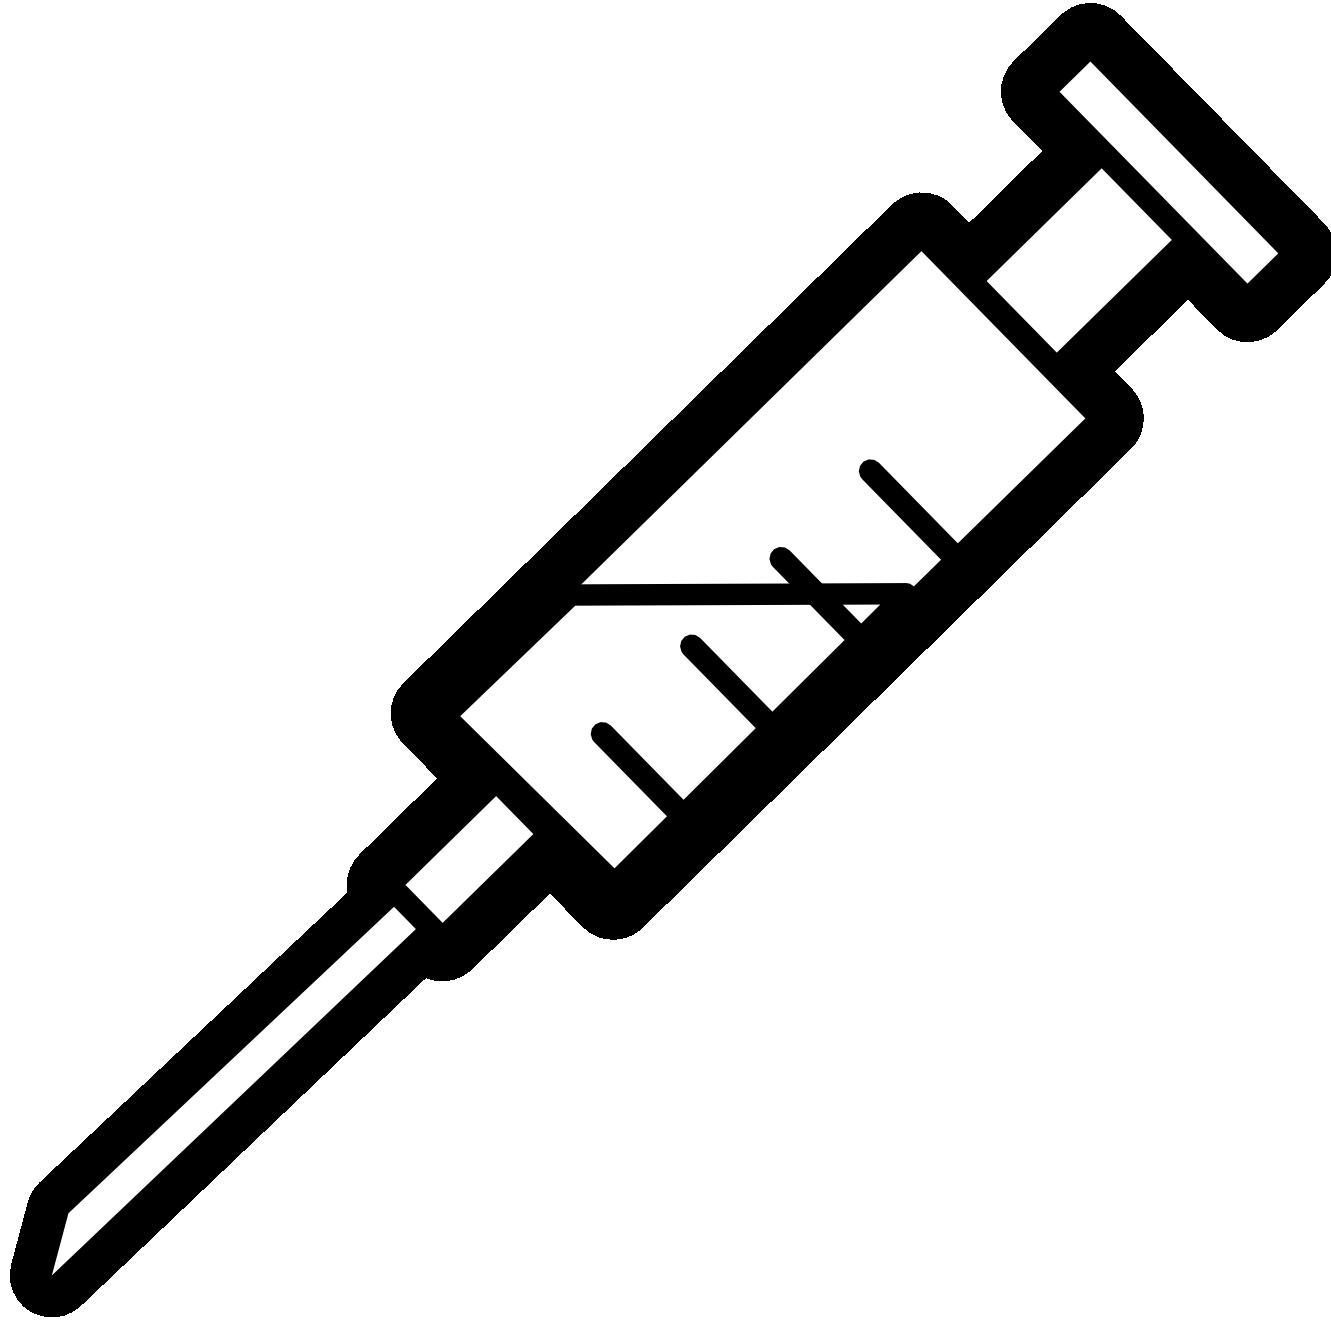 Insulin group pen needle. Diabetes clipart glucometer